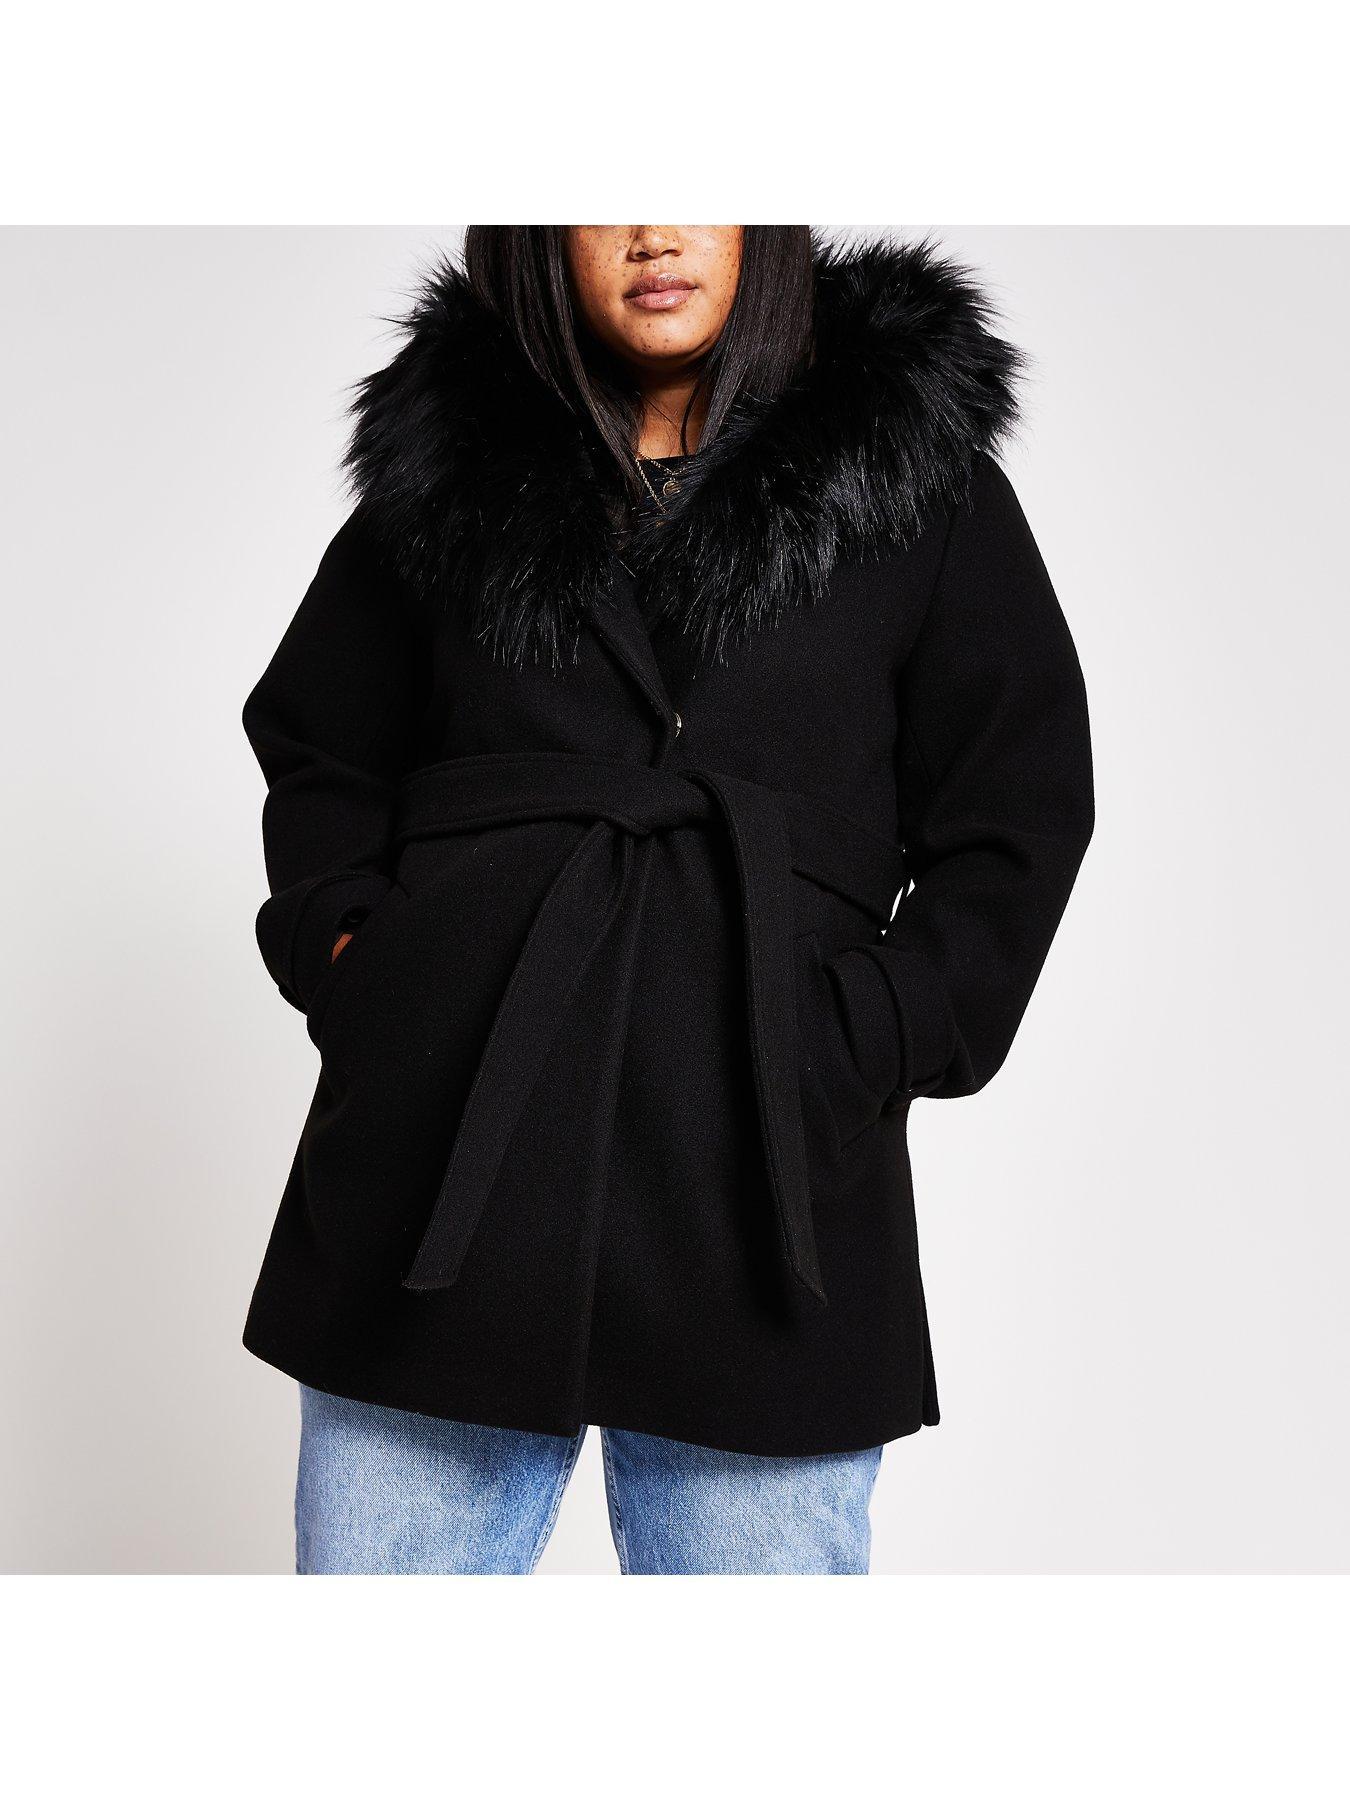 Plus Size Black Hooded Formal Coat